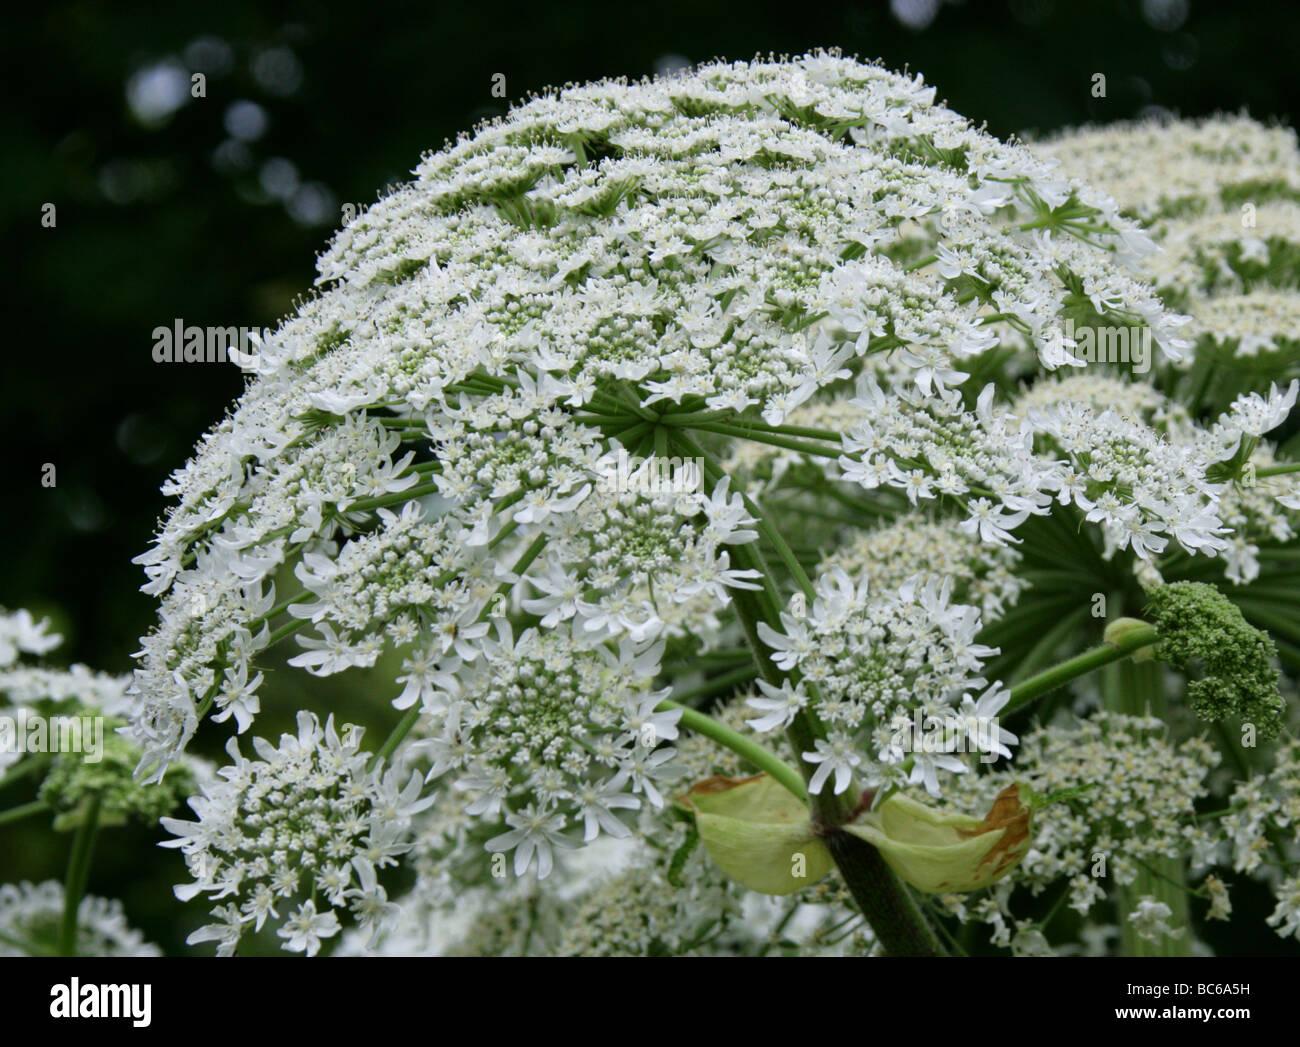 Giant Hogweed or Giant Cow-parsley, Heracleum mantegazzianum, Apiaceae Stock Photo